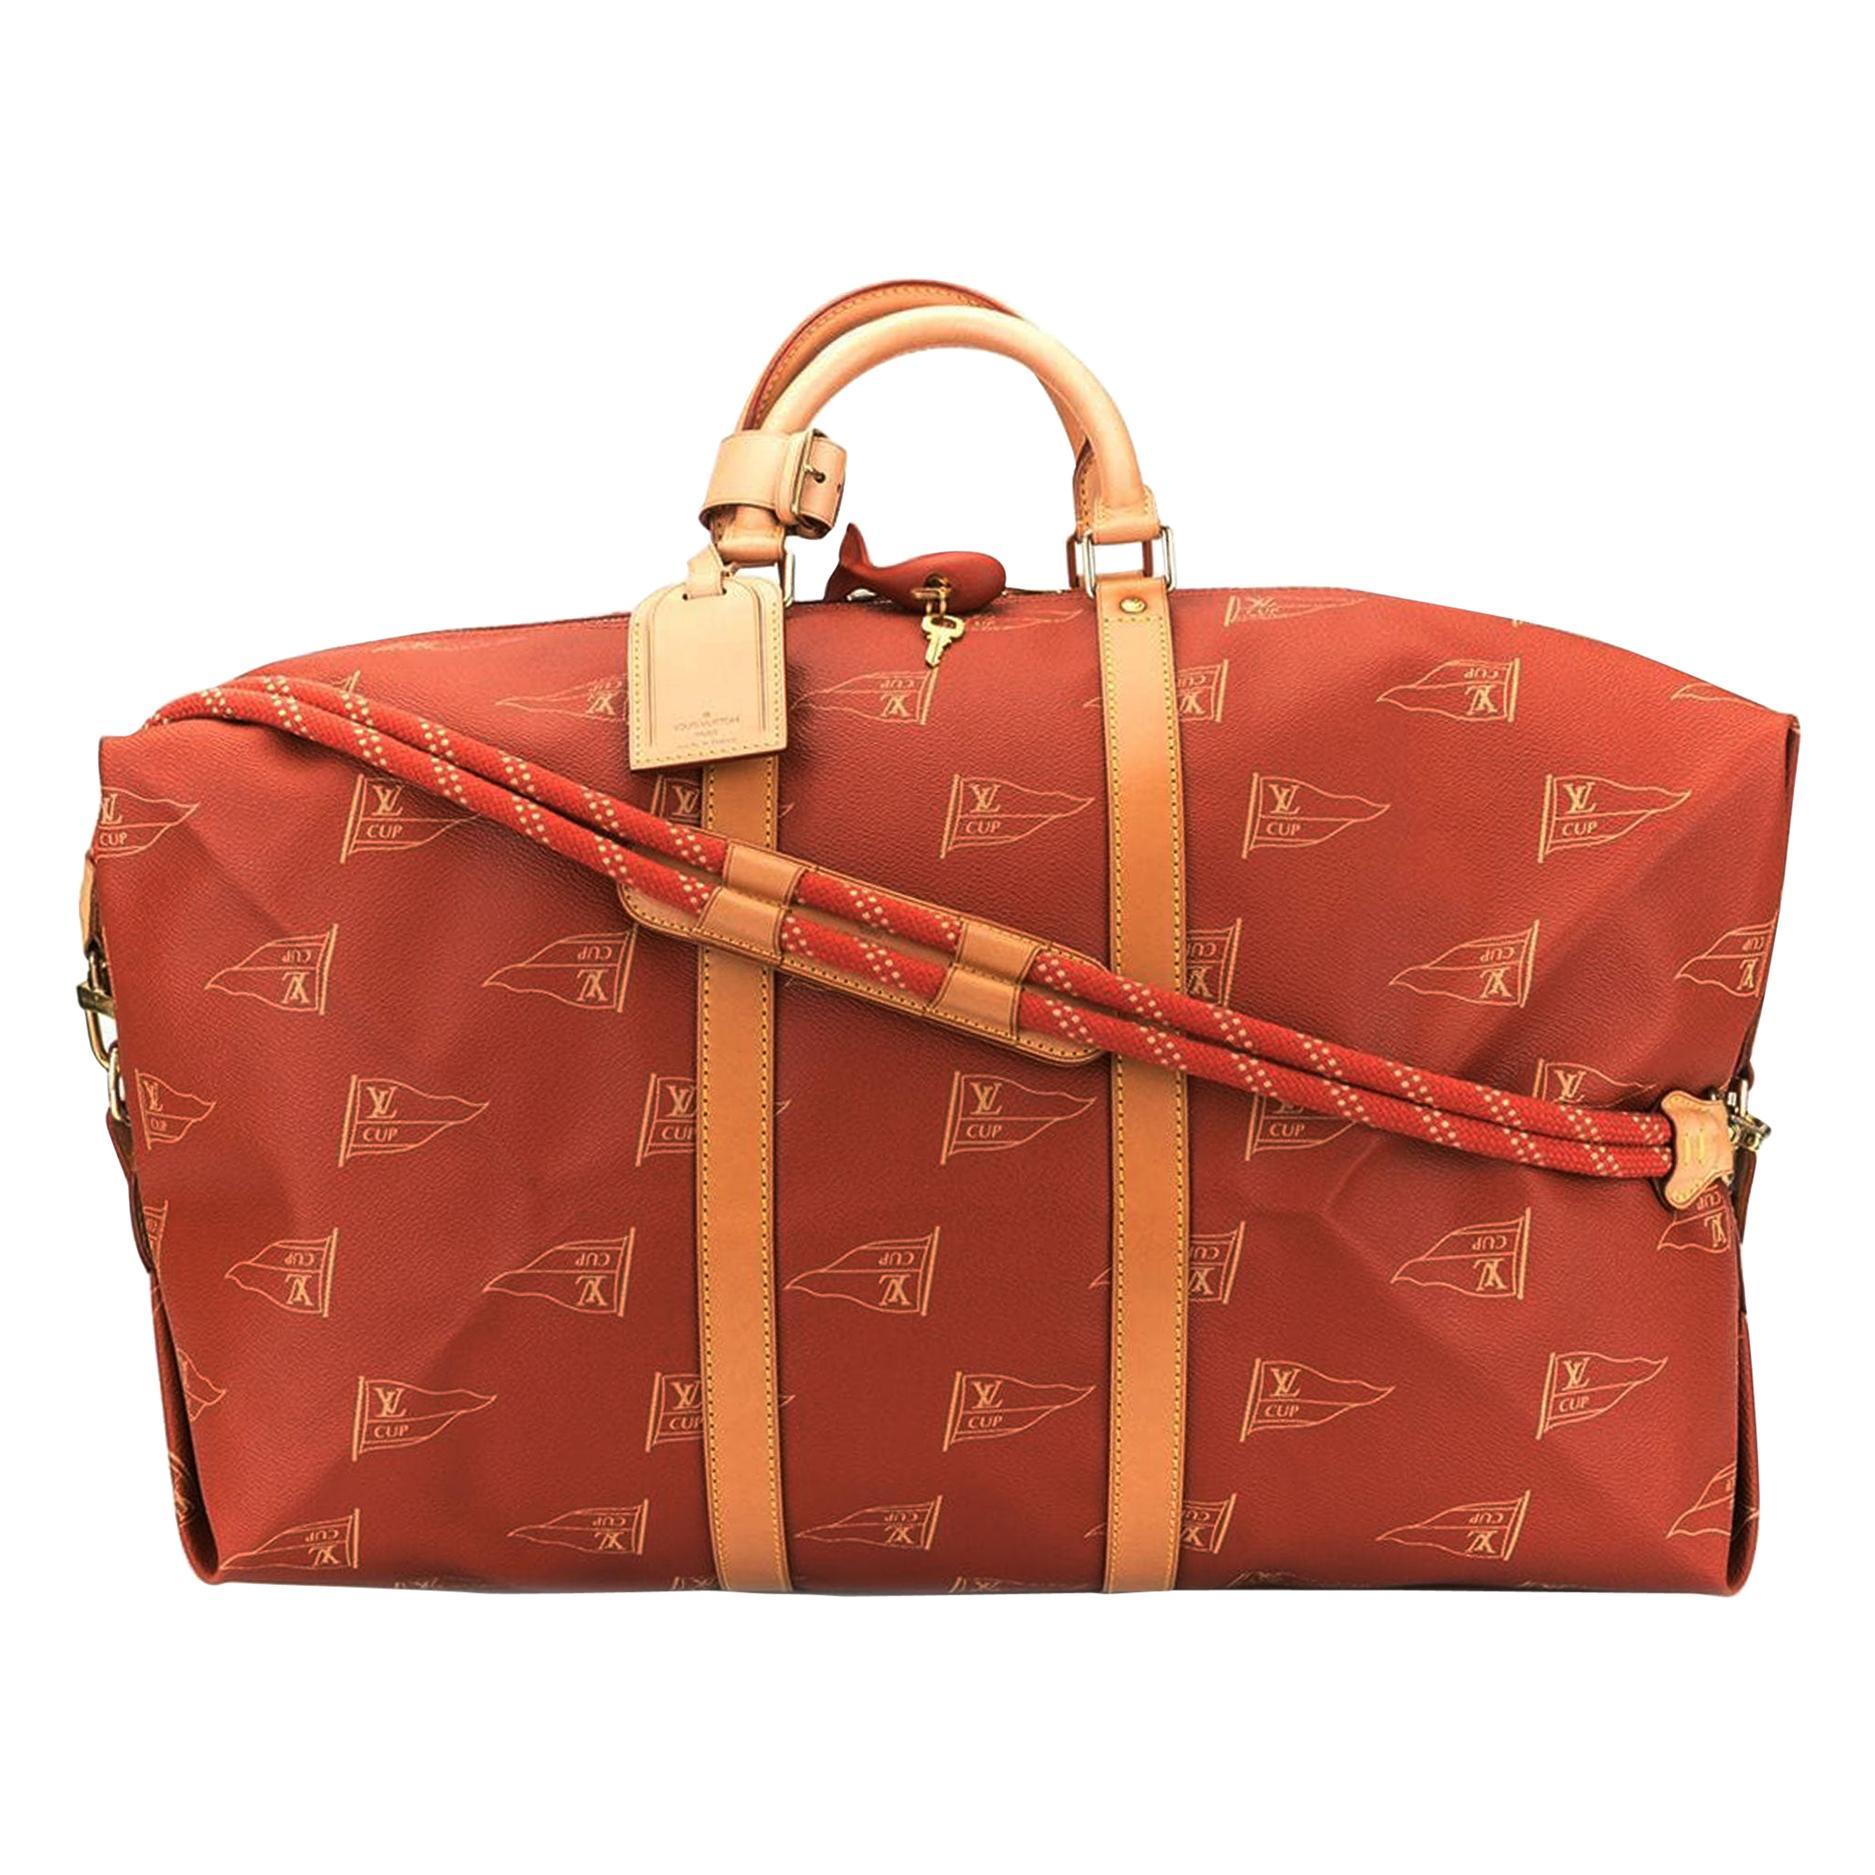 Louis Vuitton Keepall Sailing Boating Duffel Rare Limited Edition Bag